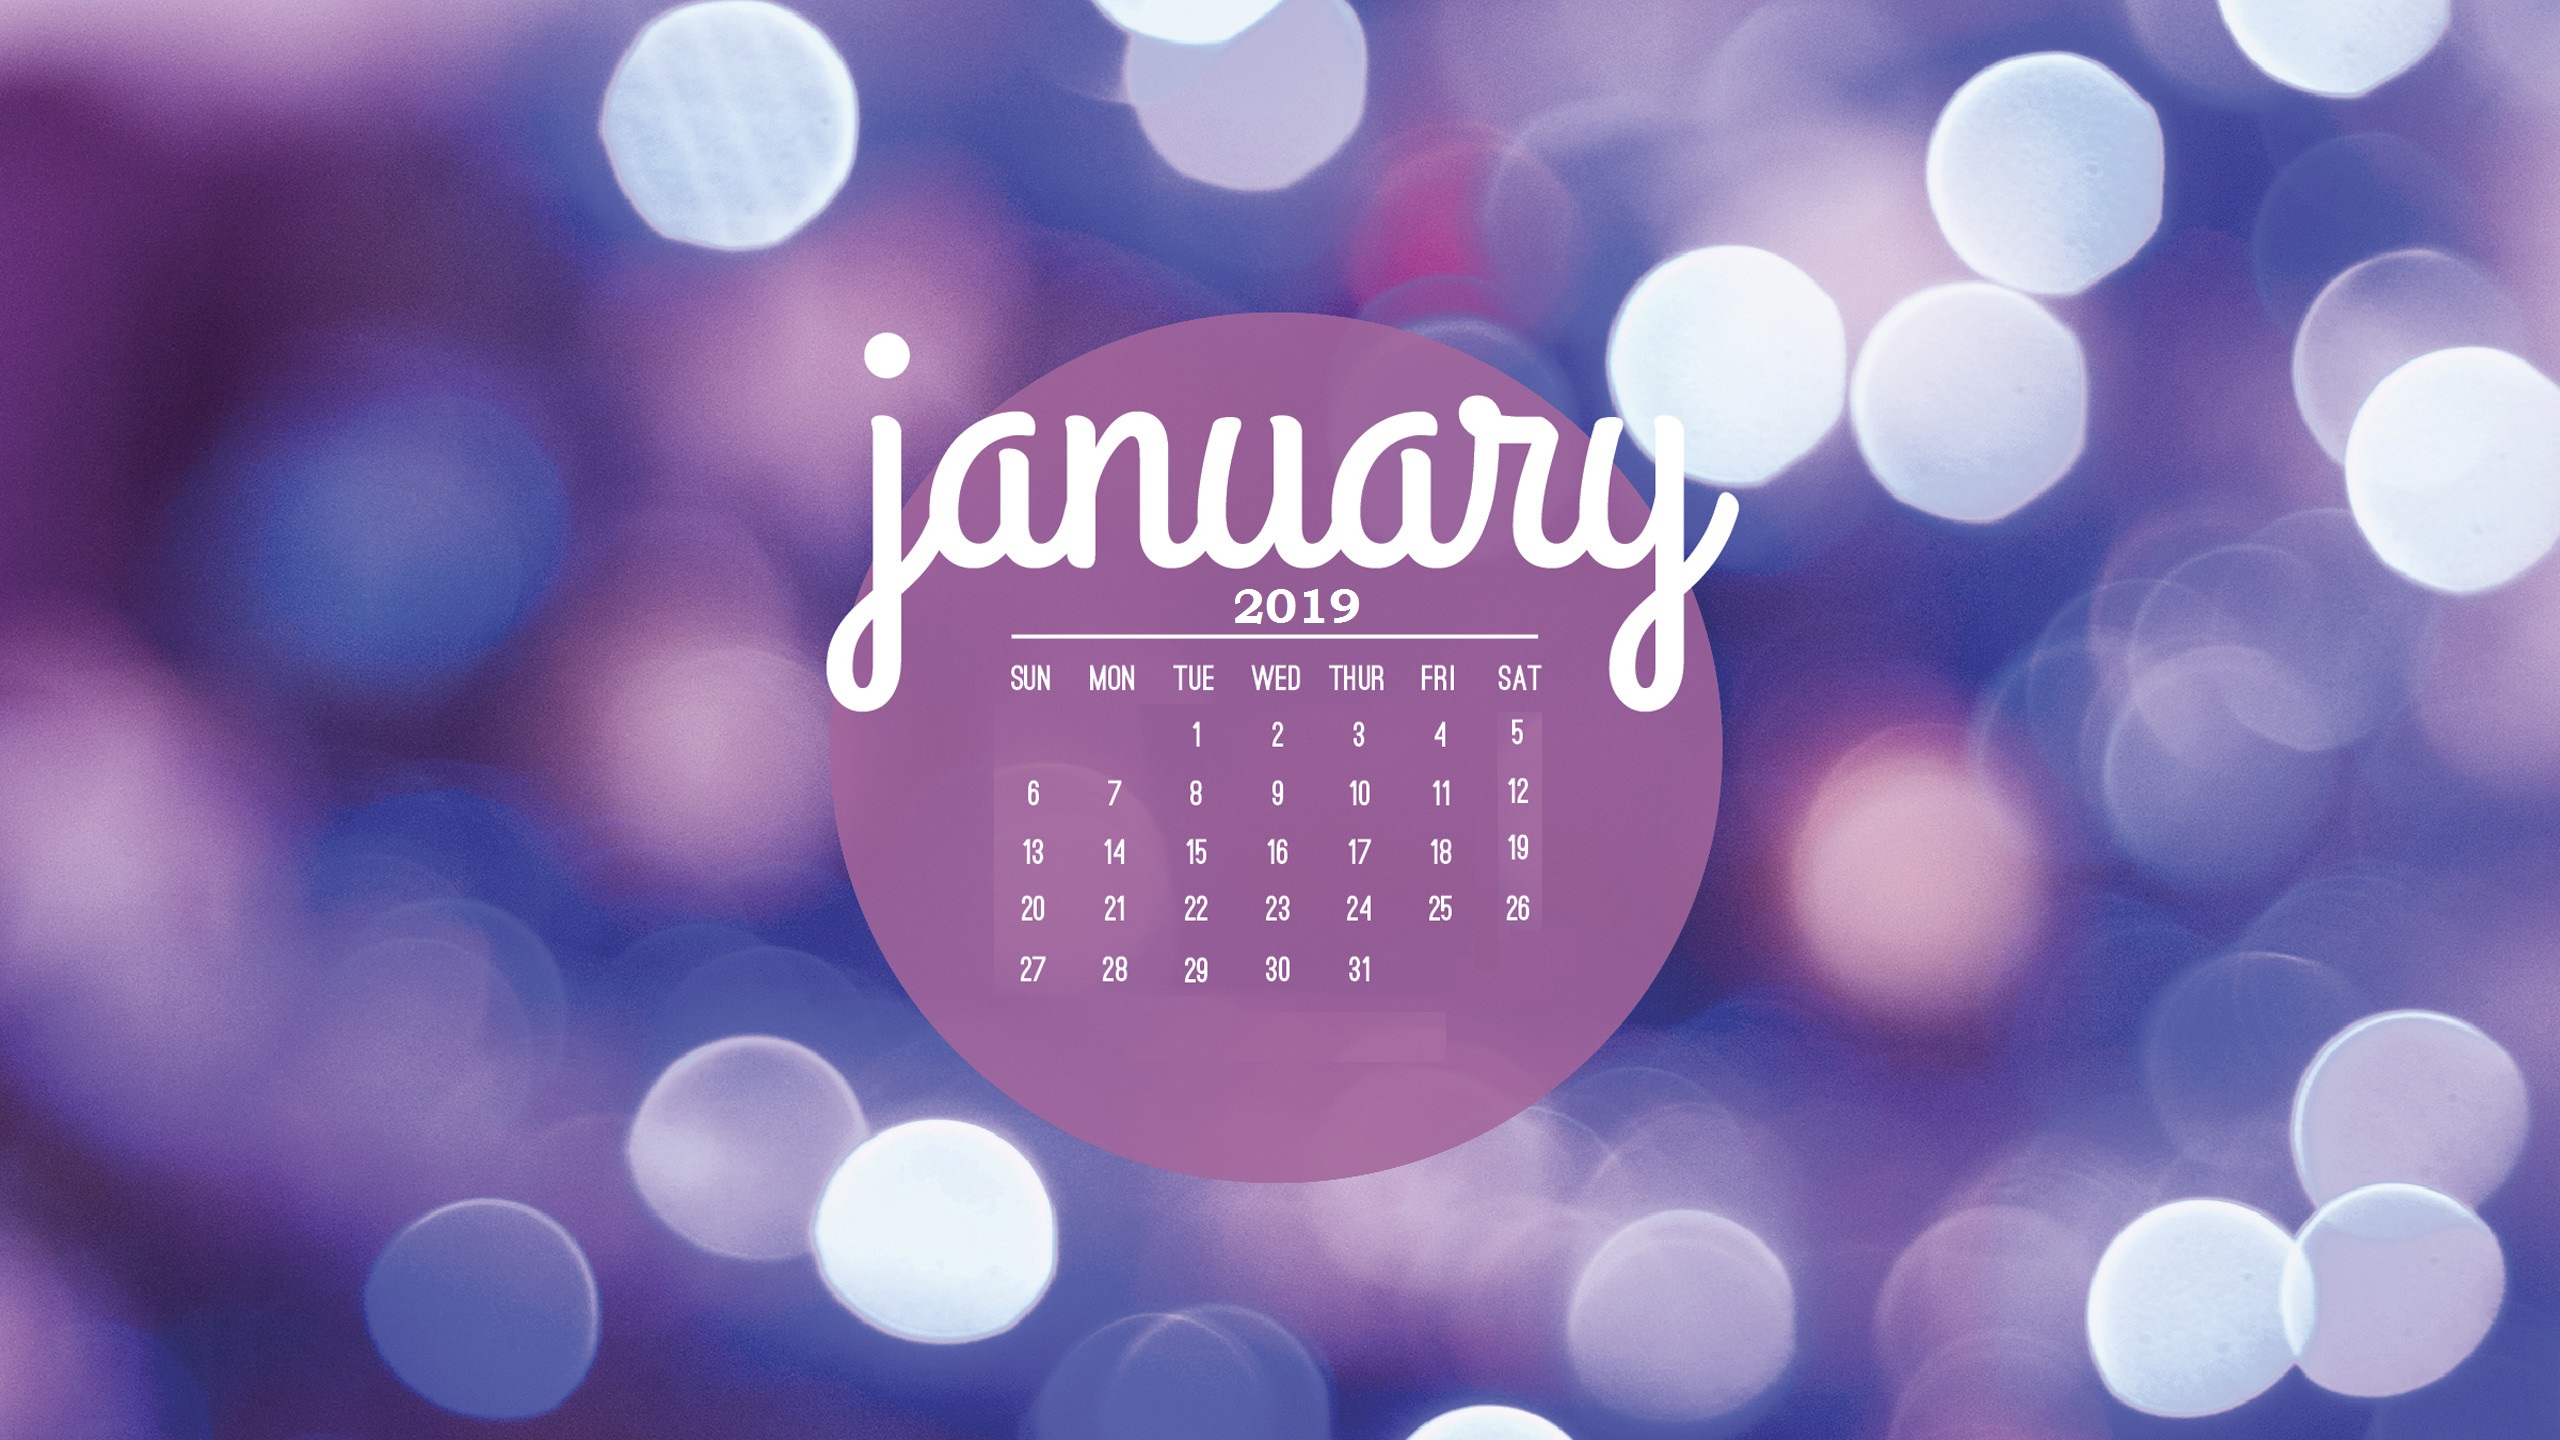 January 2019 HD Calendar Wallpapers Calendar 2019 2560x1440